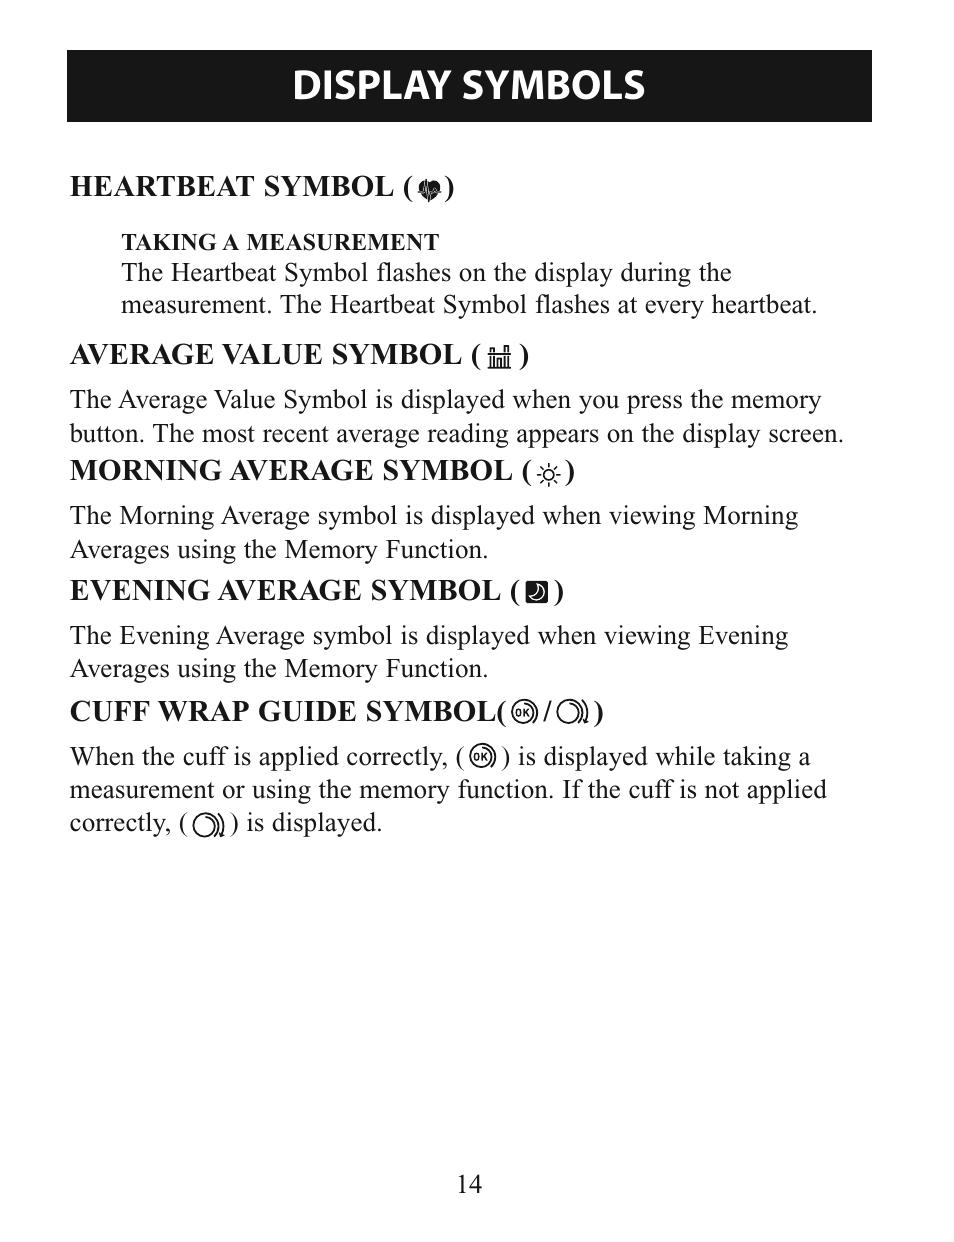 Display Symbols Omron Healthcare Intellisense Bp760 User Manual